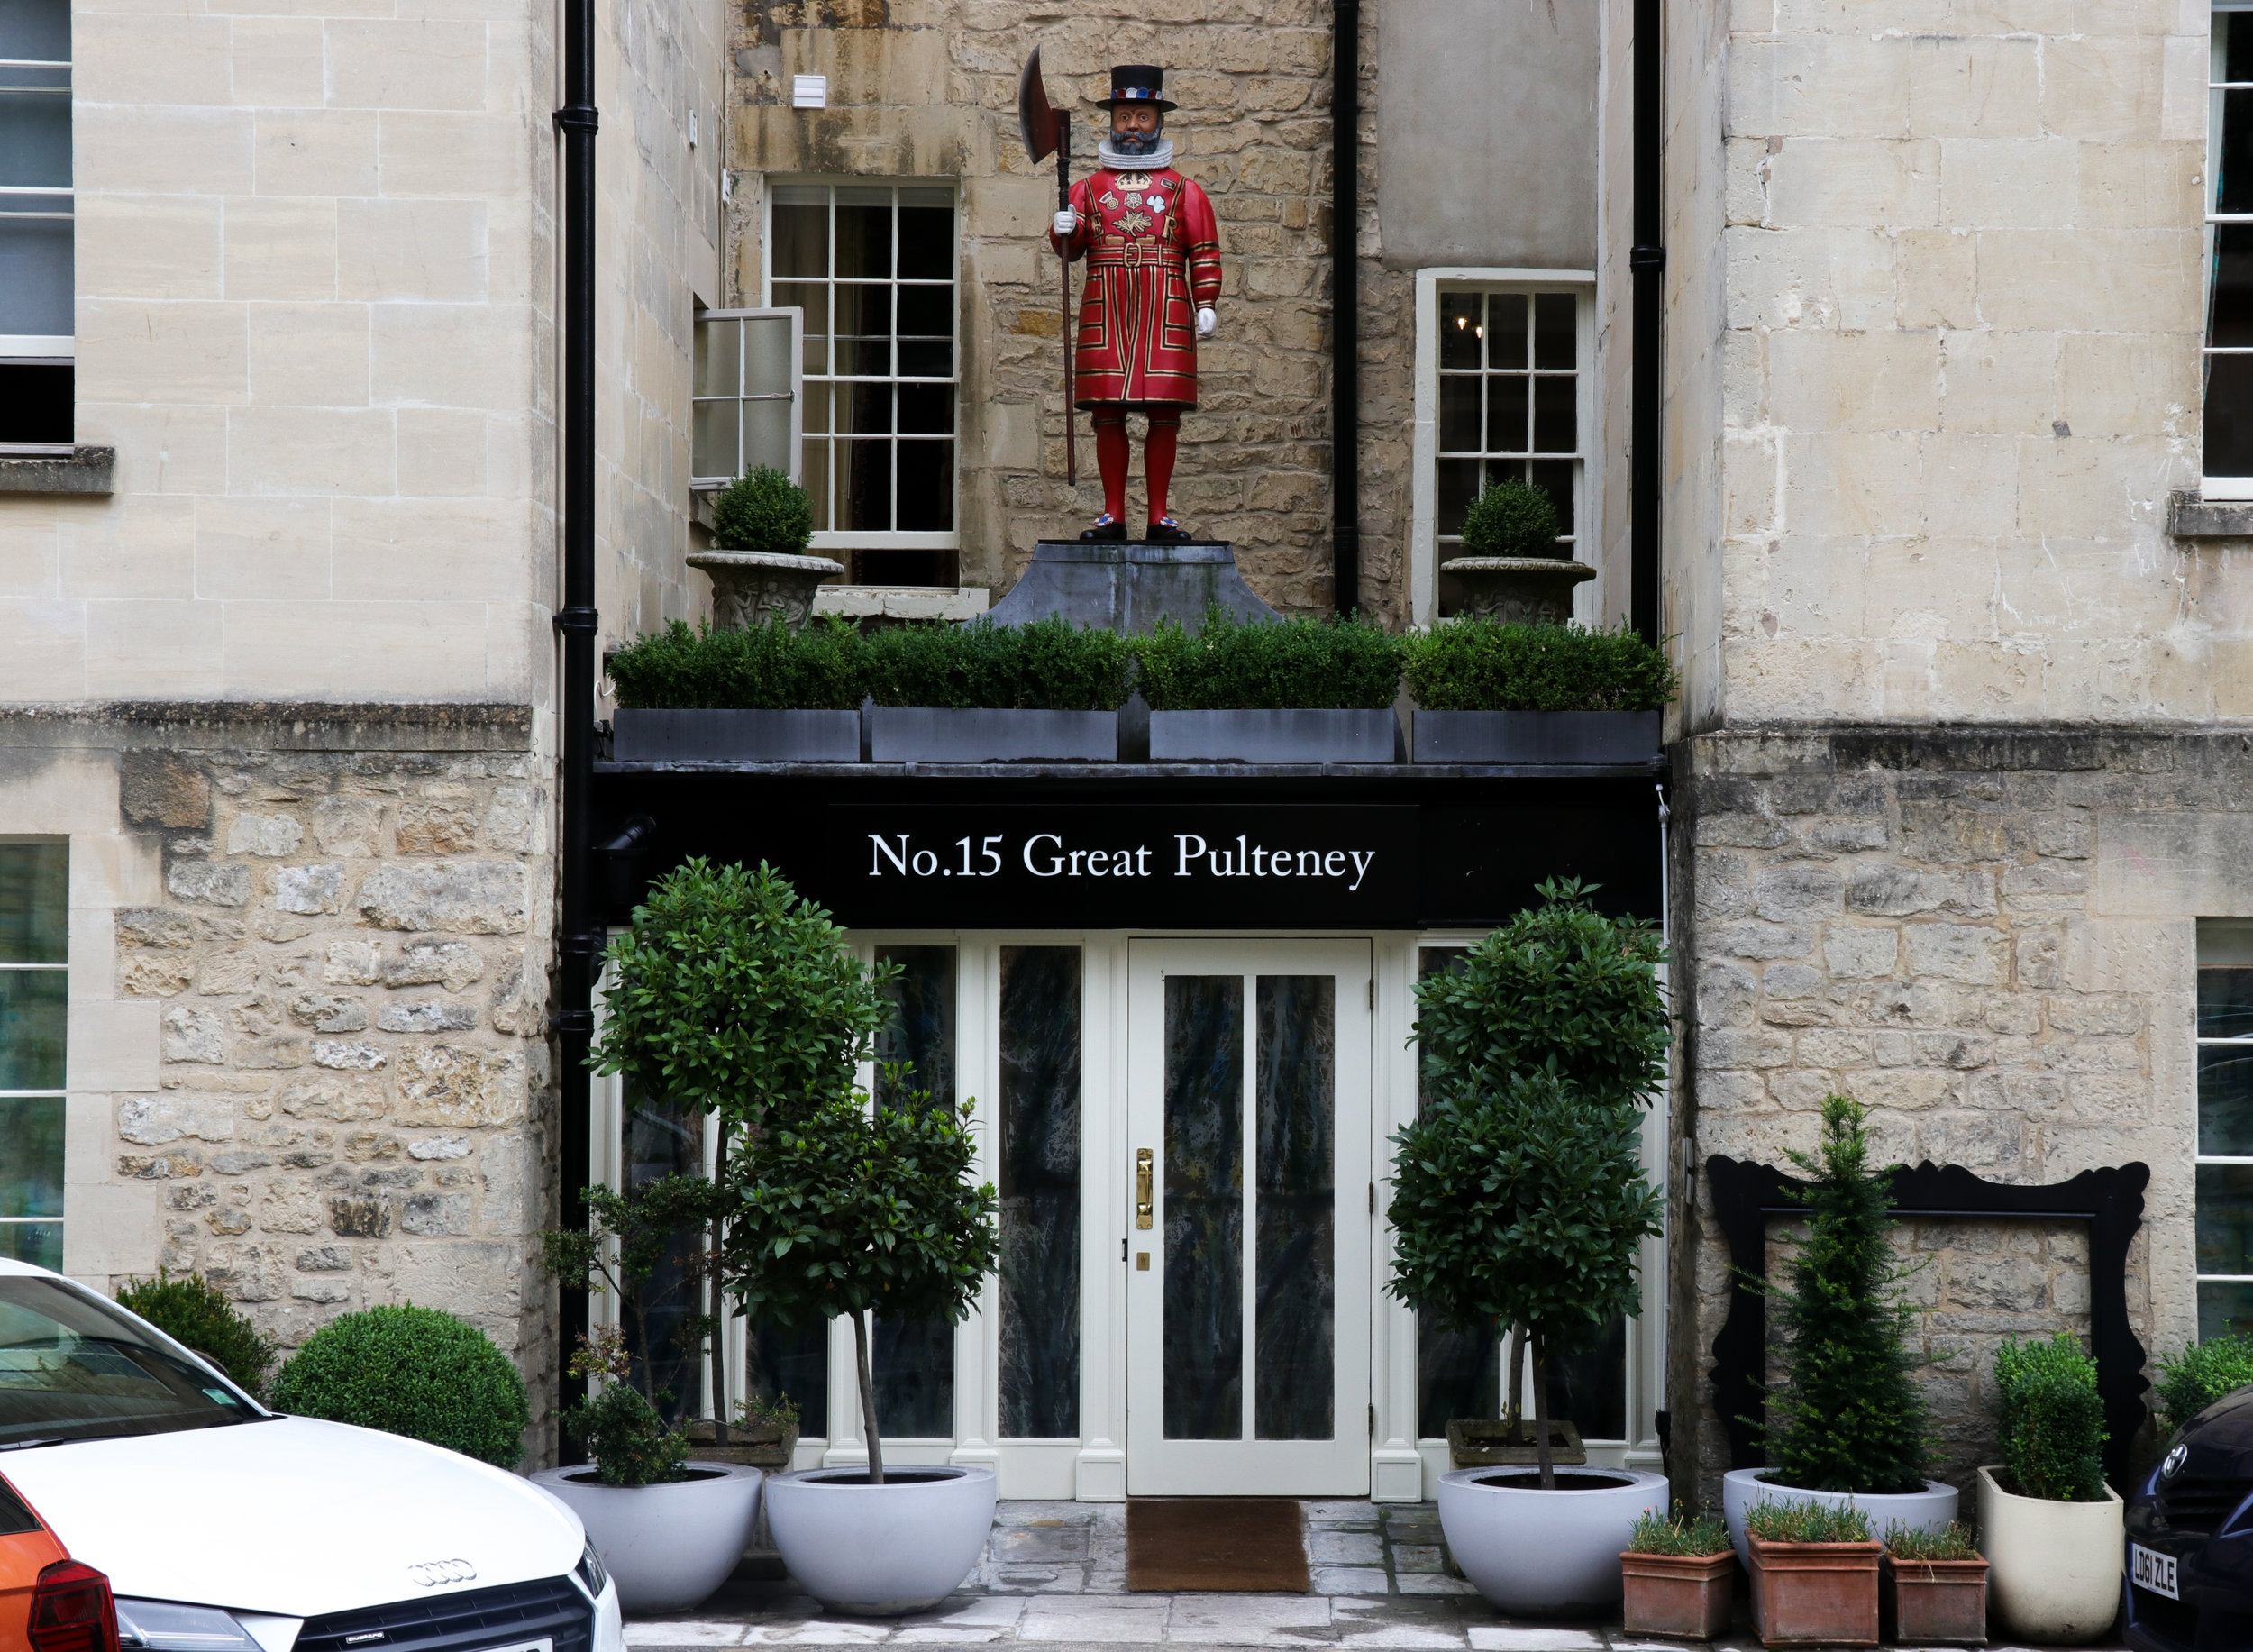 No 15 Great Pulteney Bath.jpg